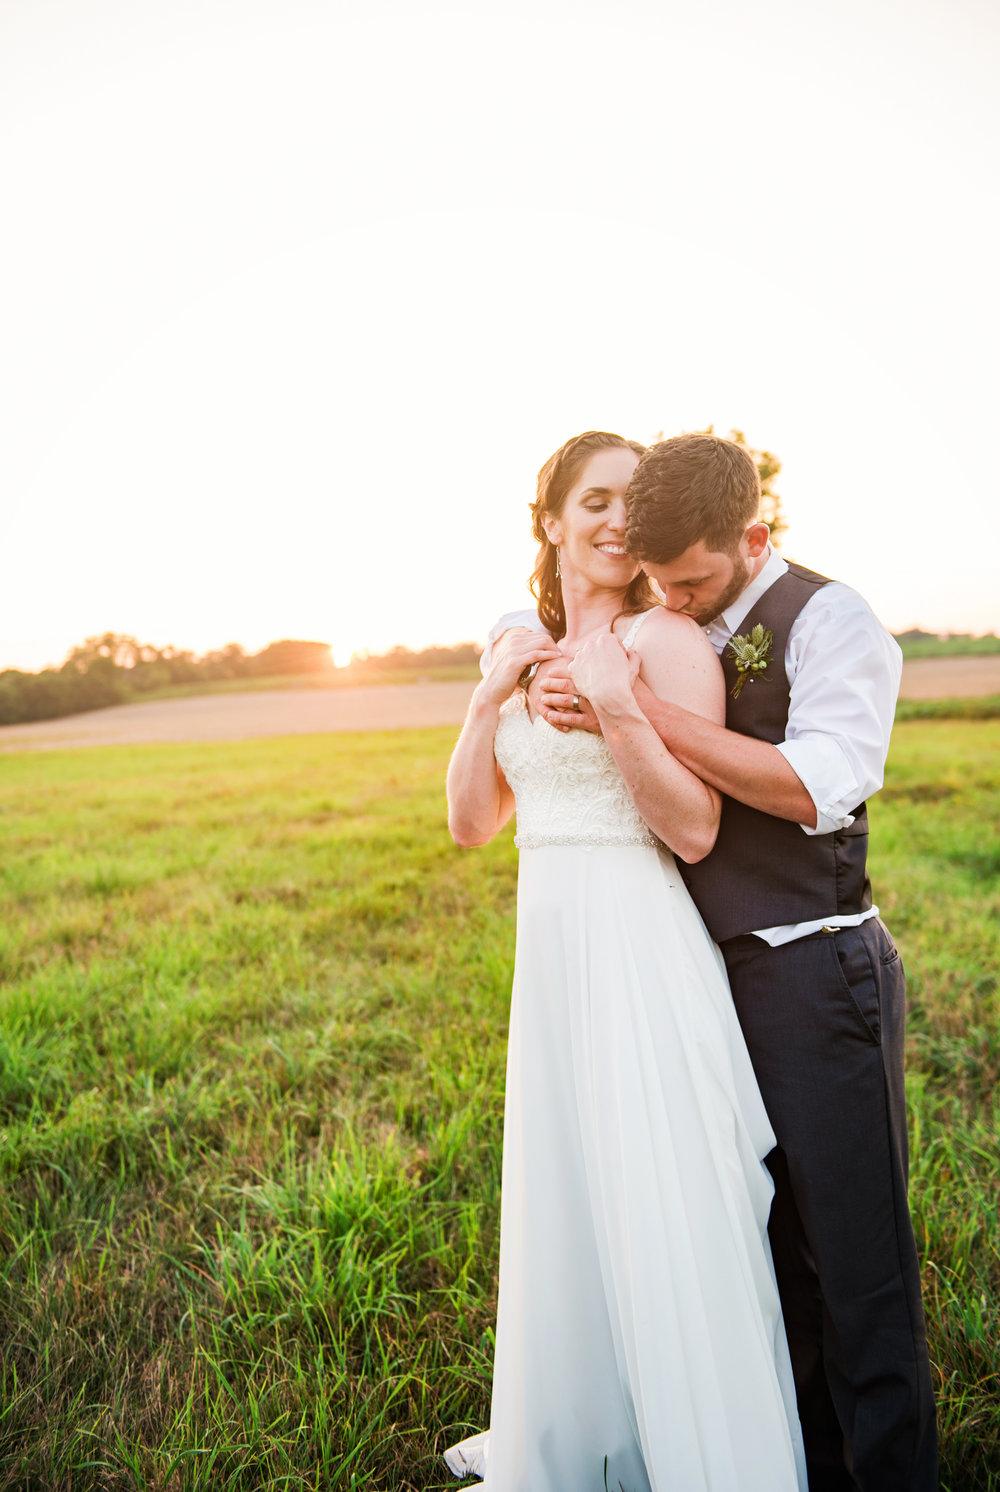 Jerris_Wadsworth_Wedding_Barn_Rochester_Wedding_JILL_STUDIO_Rochester_NY_Photographer_DSC_3101.jpg